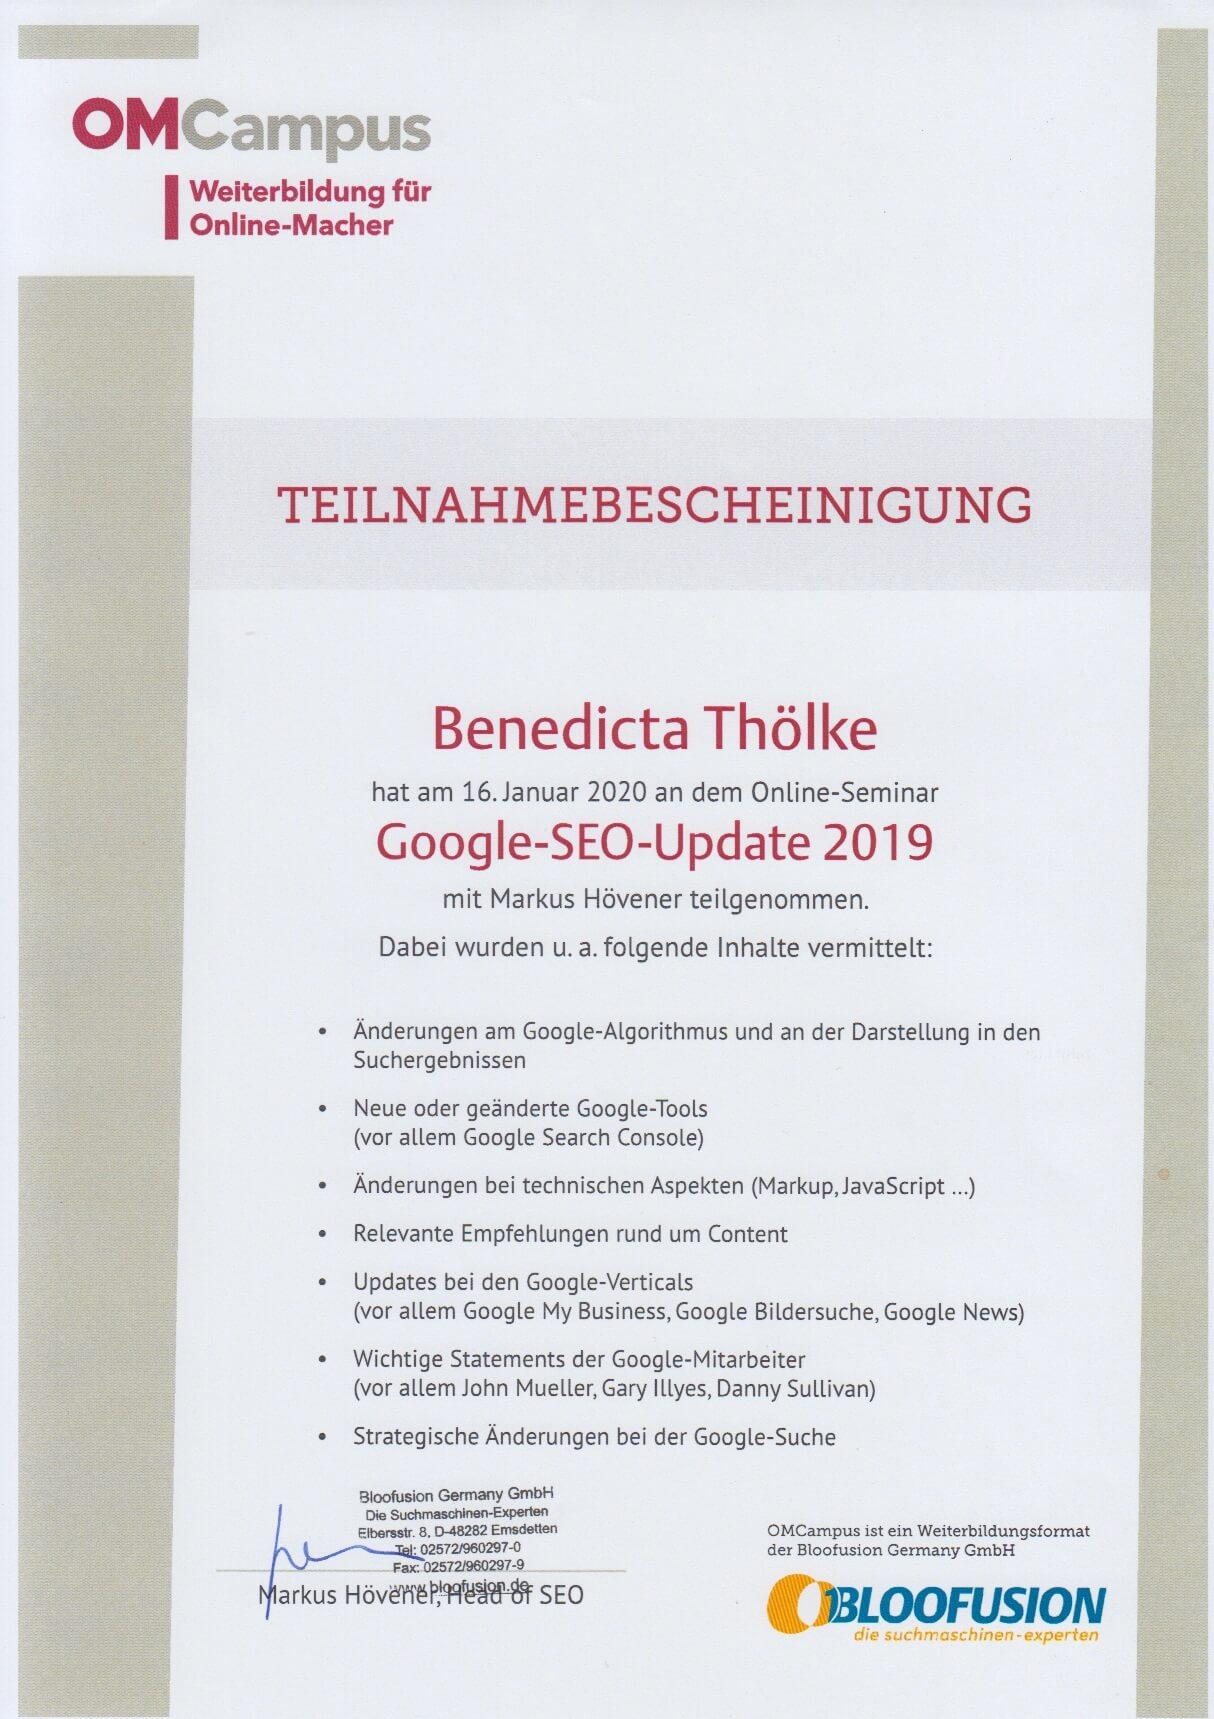 Bloofusion Google SEO Update 2019 - Teilnahmebescheinigung